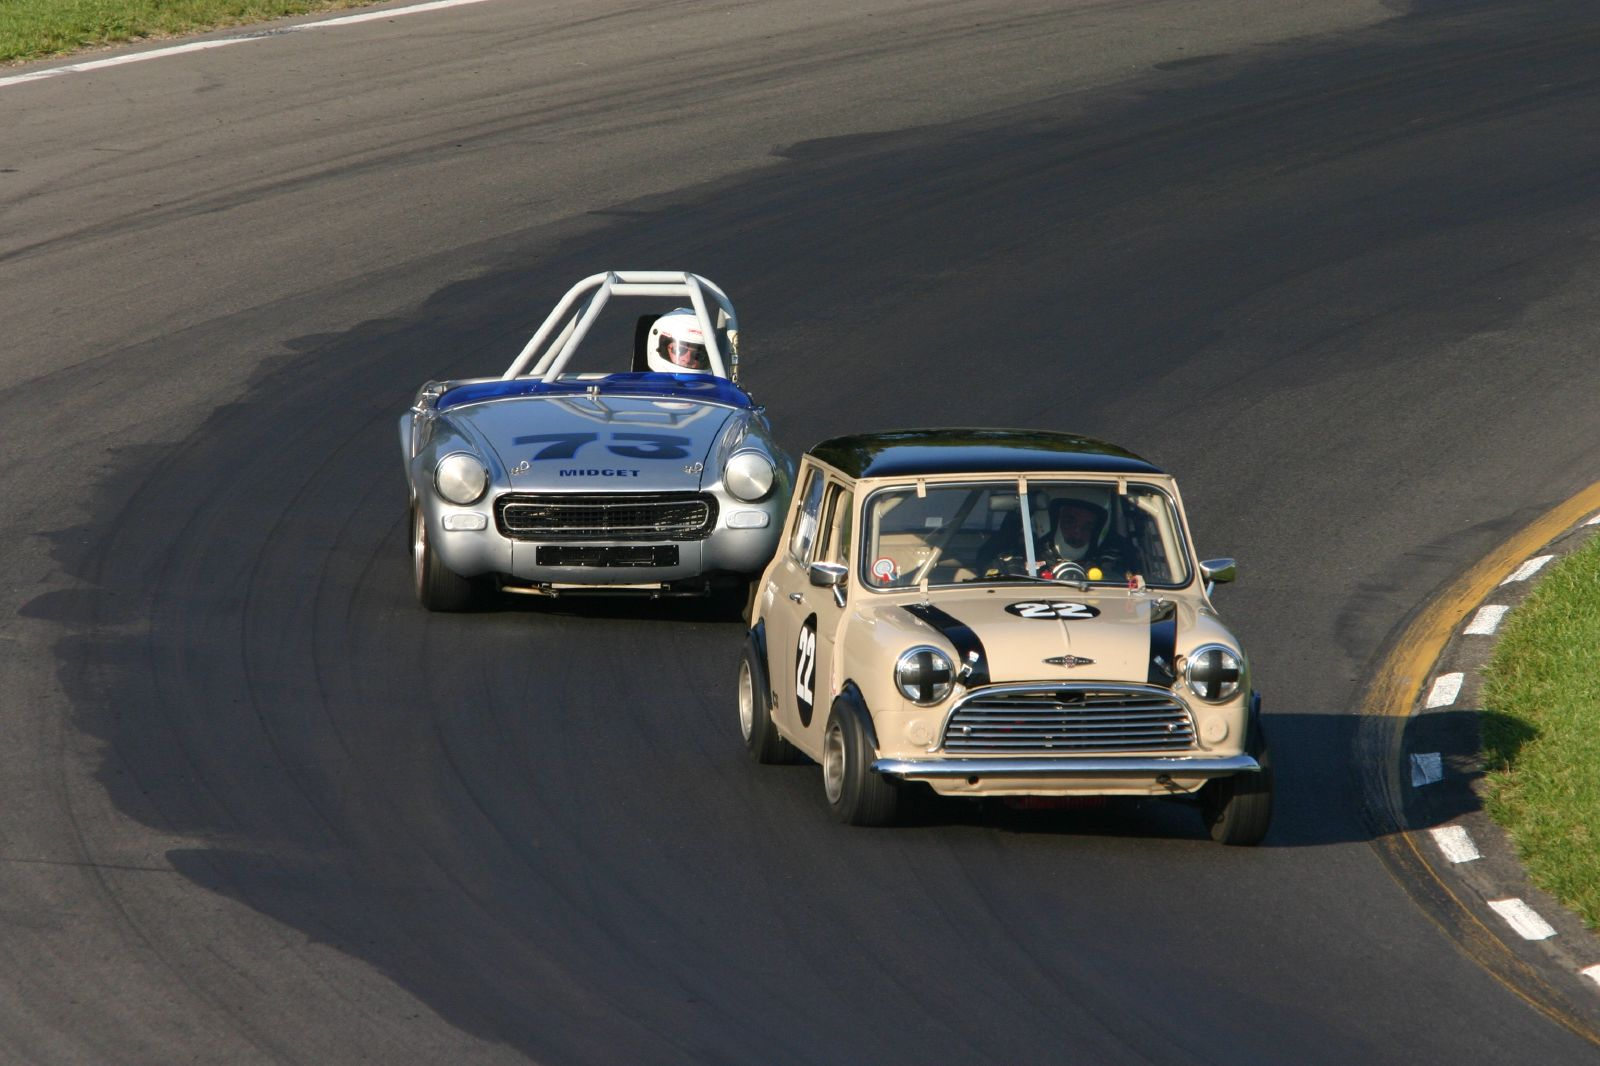 Mini Cooper Usa >> File:62 Mini Cooper-S, 70 MG Midget.jpg - Wikimedia Commons